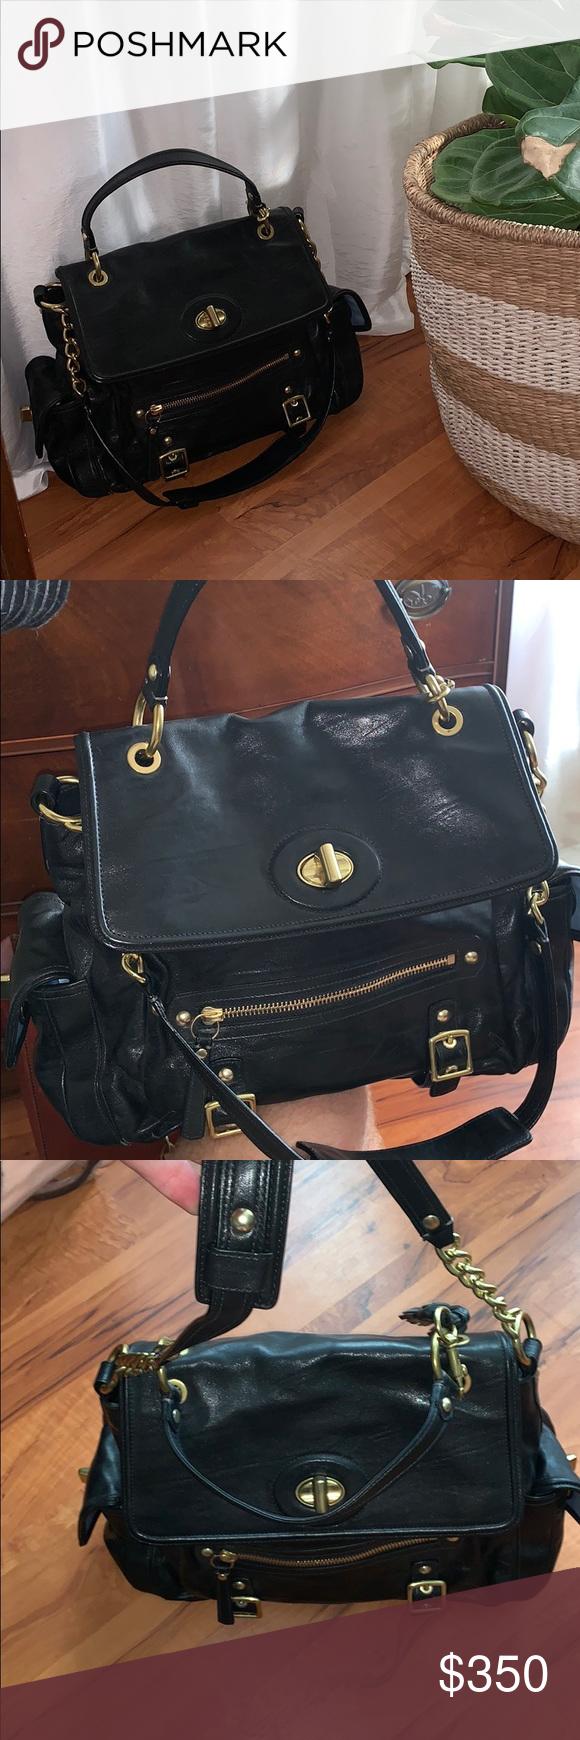 Coach Handbag Black Leather Handbags